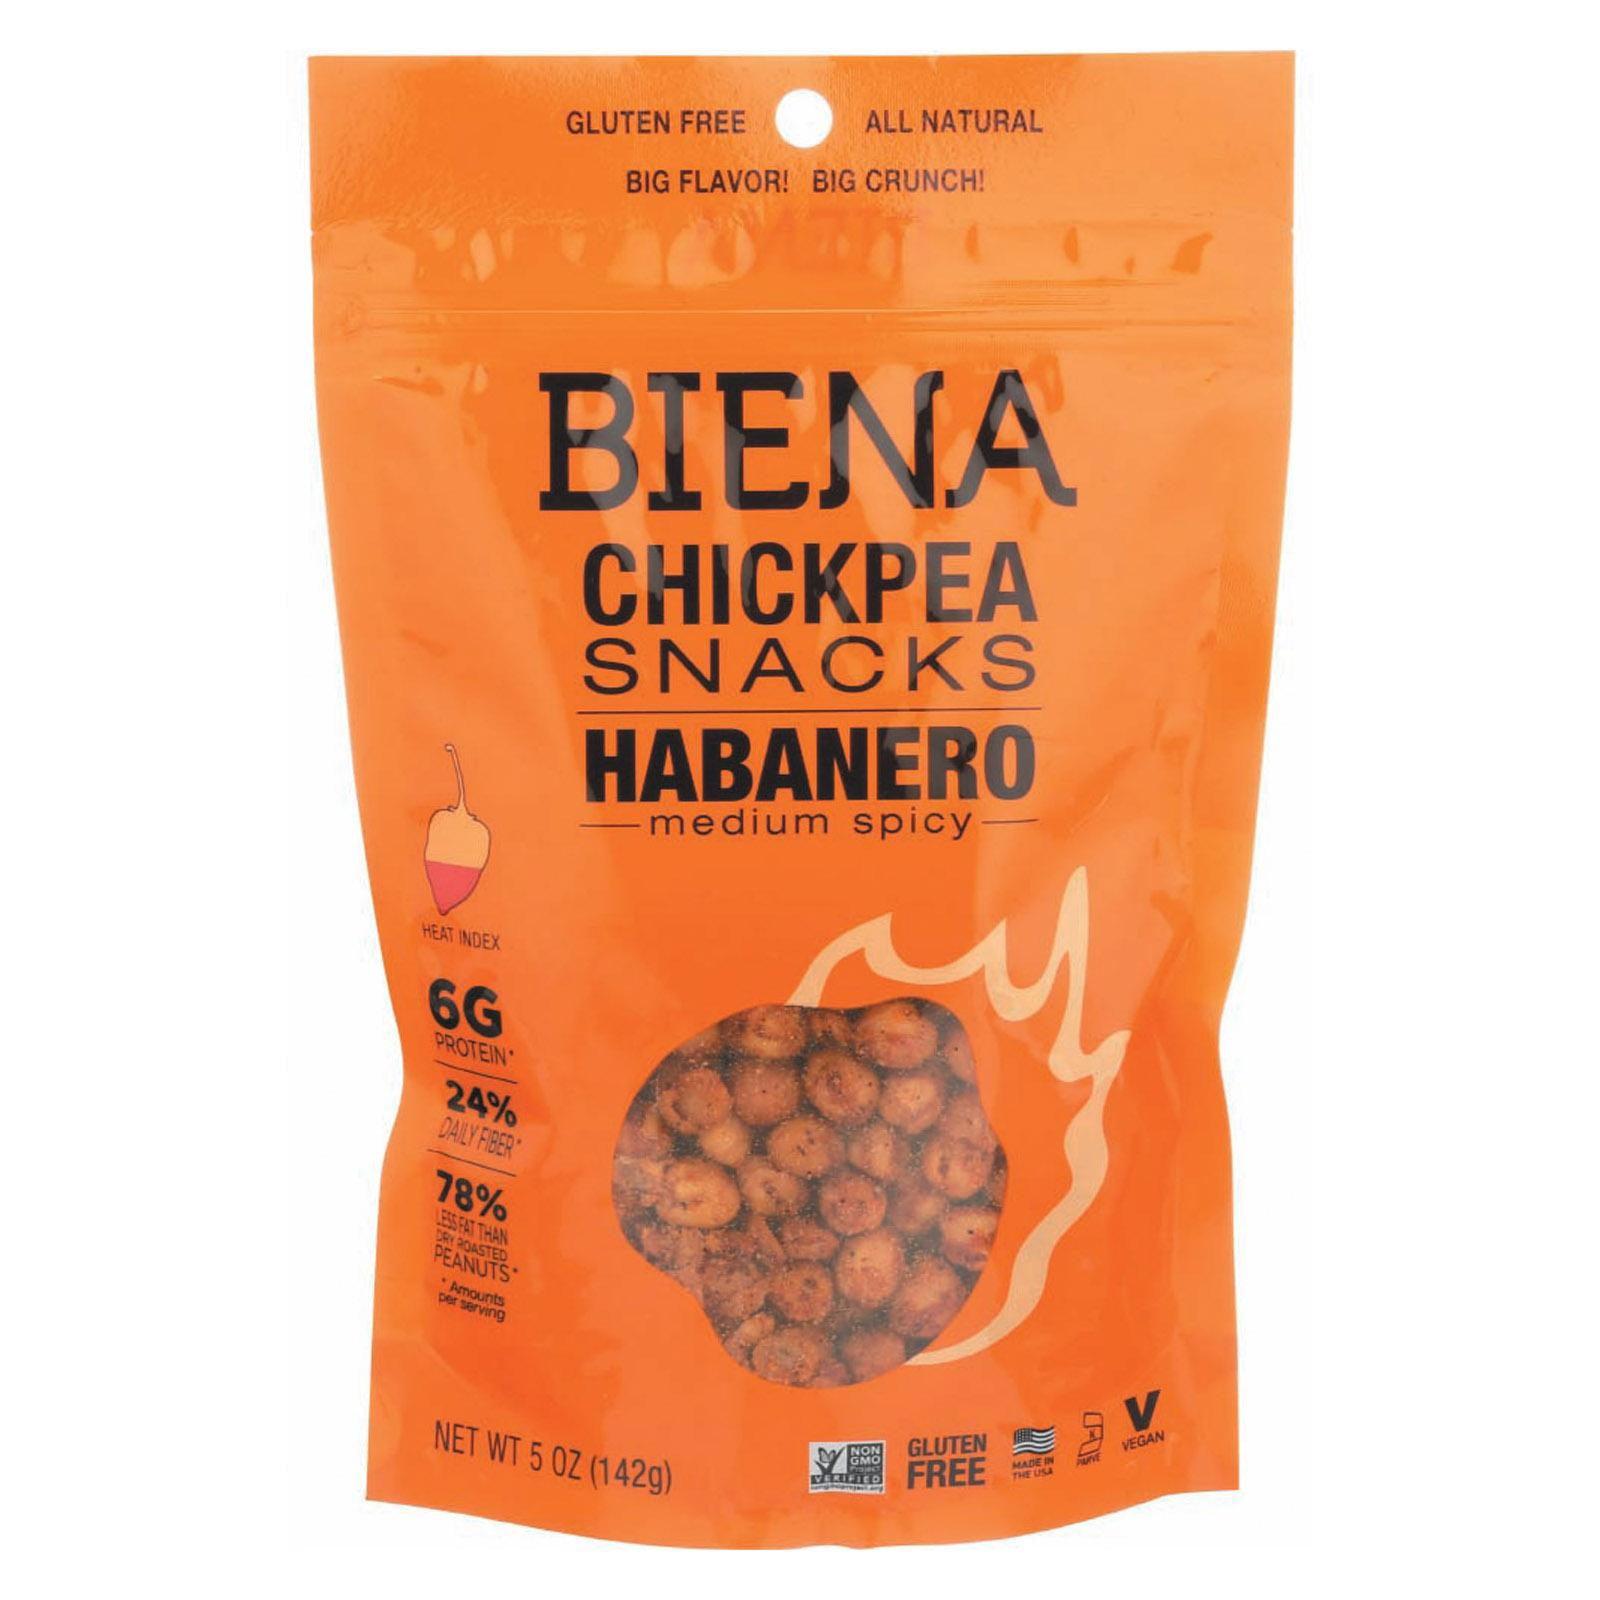 Biena Chickpea Snacks - Habanero - pack of 8 - 5 Oz.